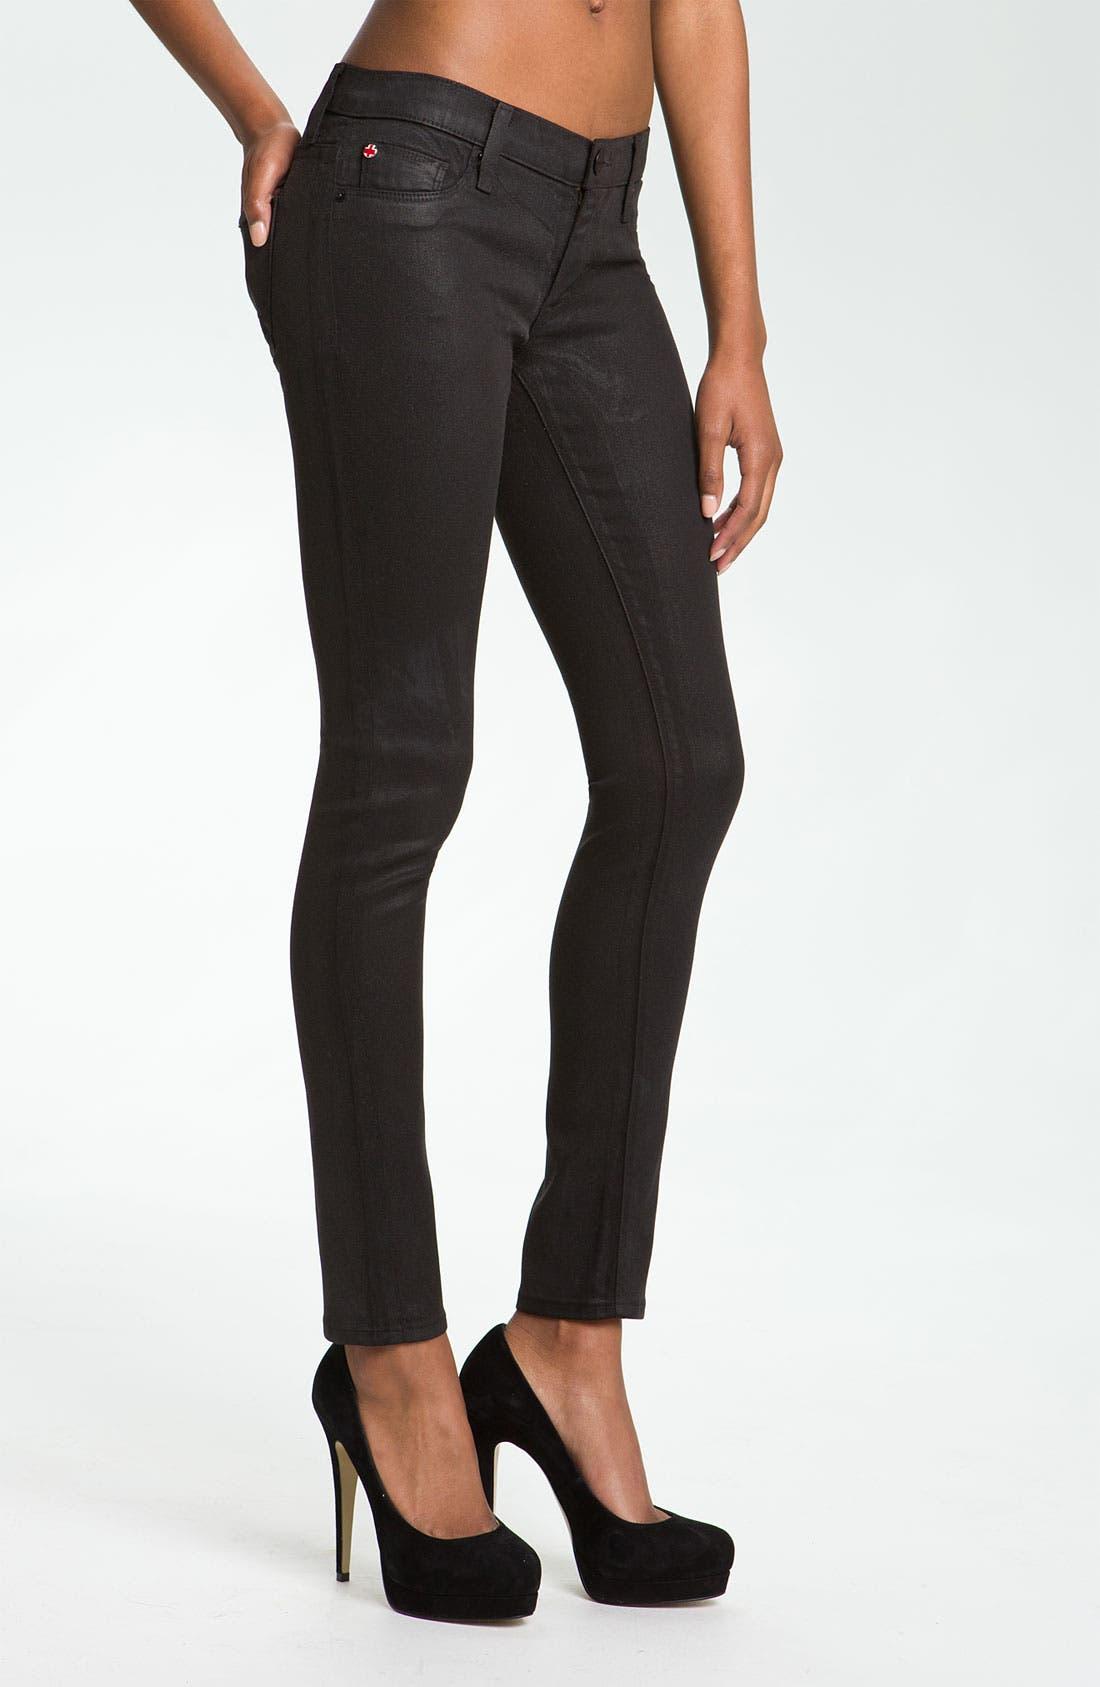 Alternate Image 1 Selected - Hudson Jeans 'Krista' Super Skinny Jeans (Black Wax)